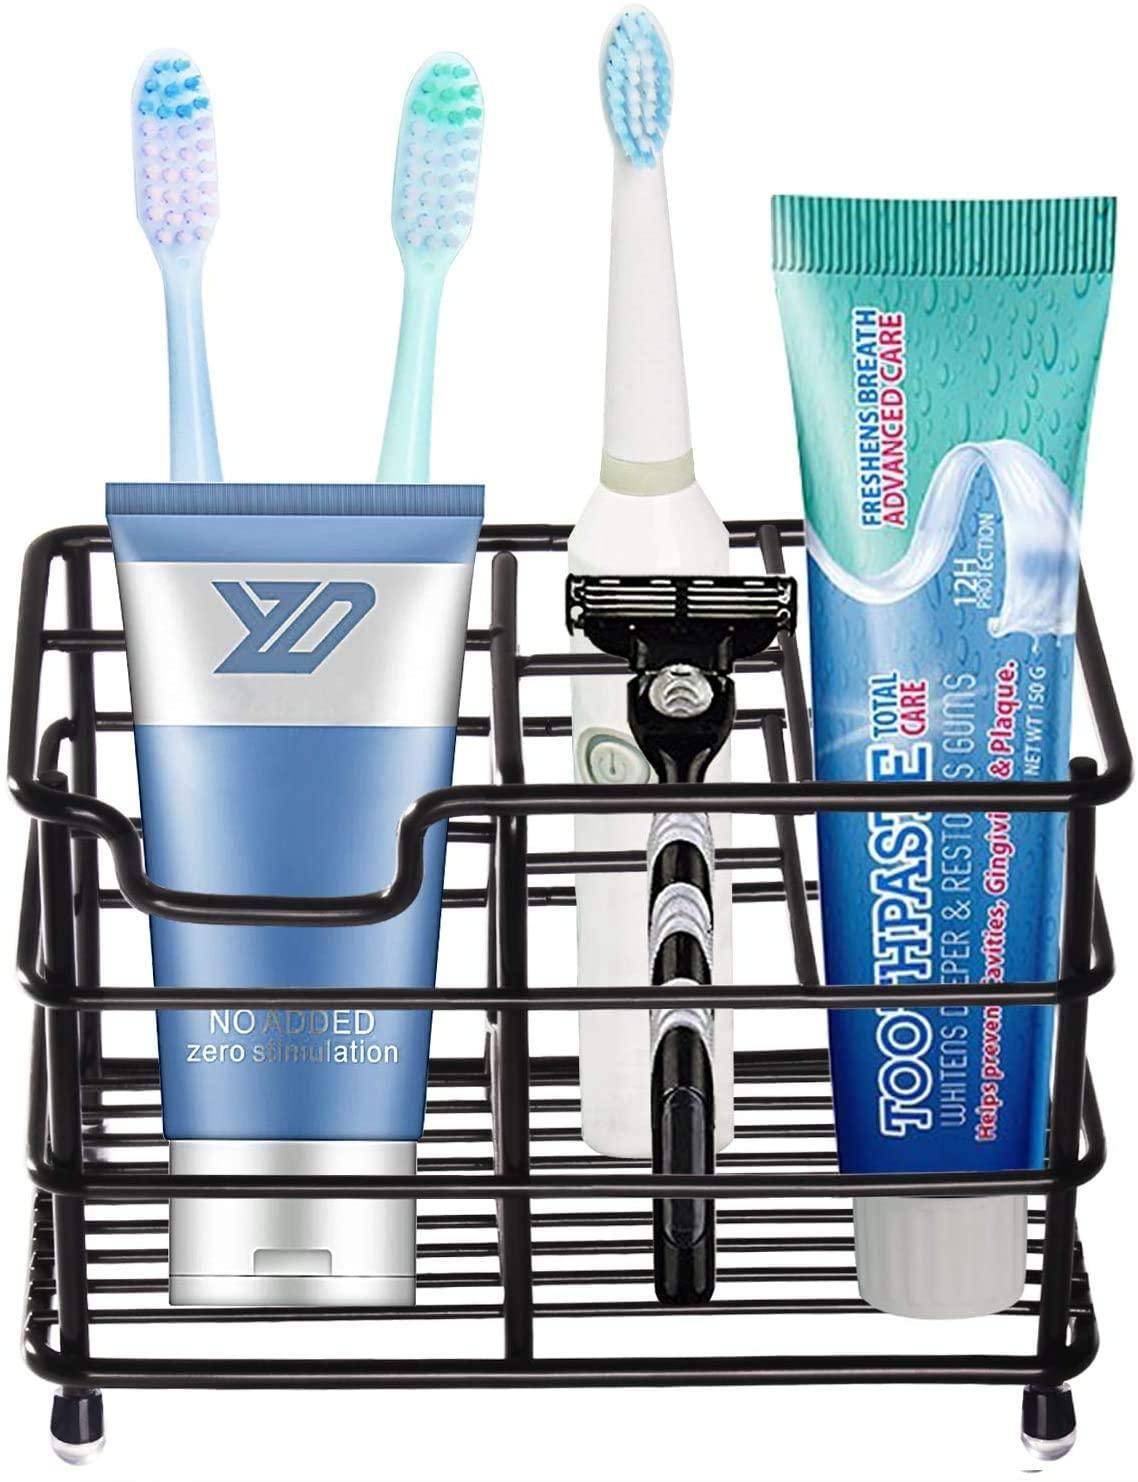 beLaxed Toothbrush Holder for Bathroom, Stainless Steel Rustproof Toothpaste Stand Set, Bathroom Sink Organizer Dispenser